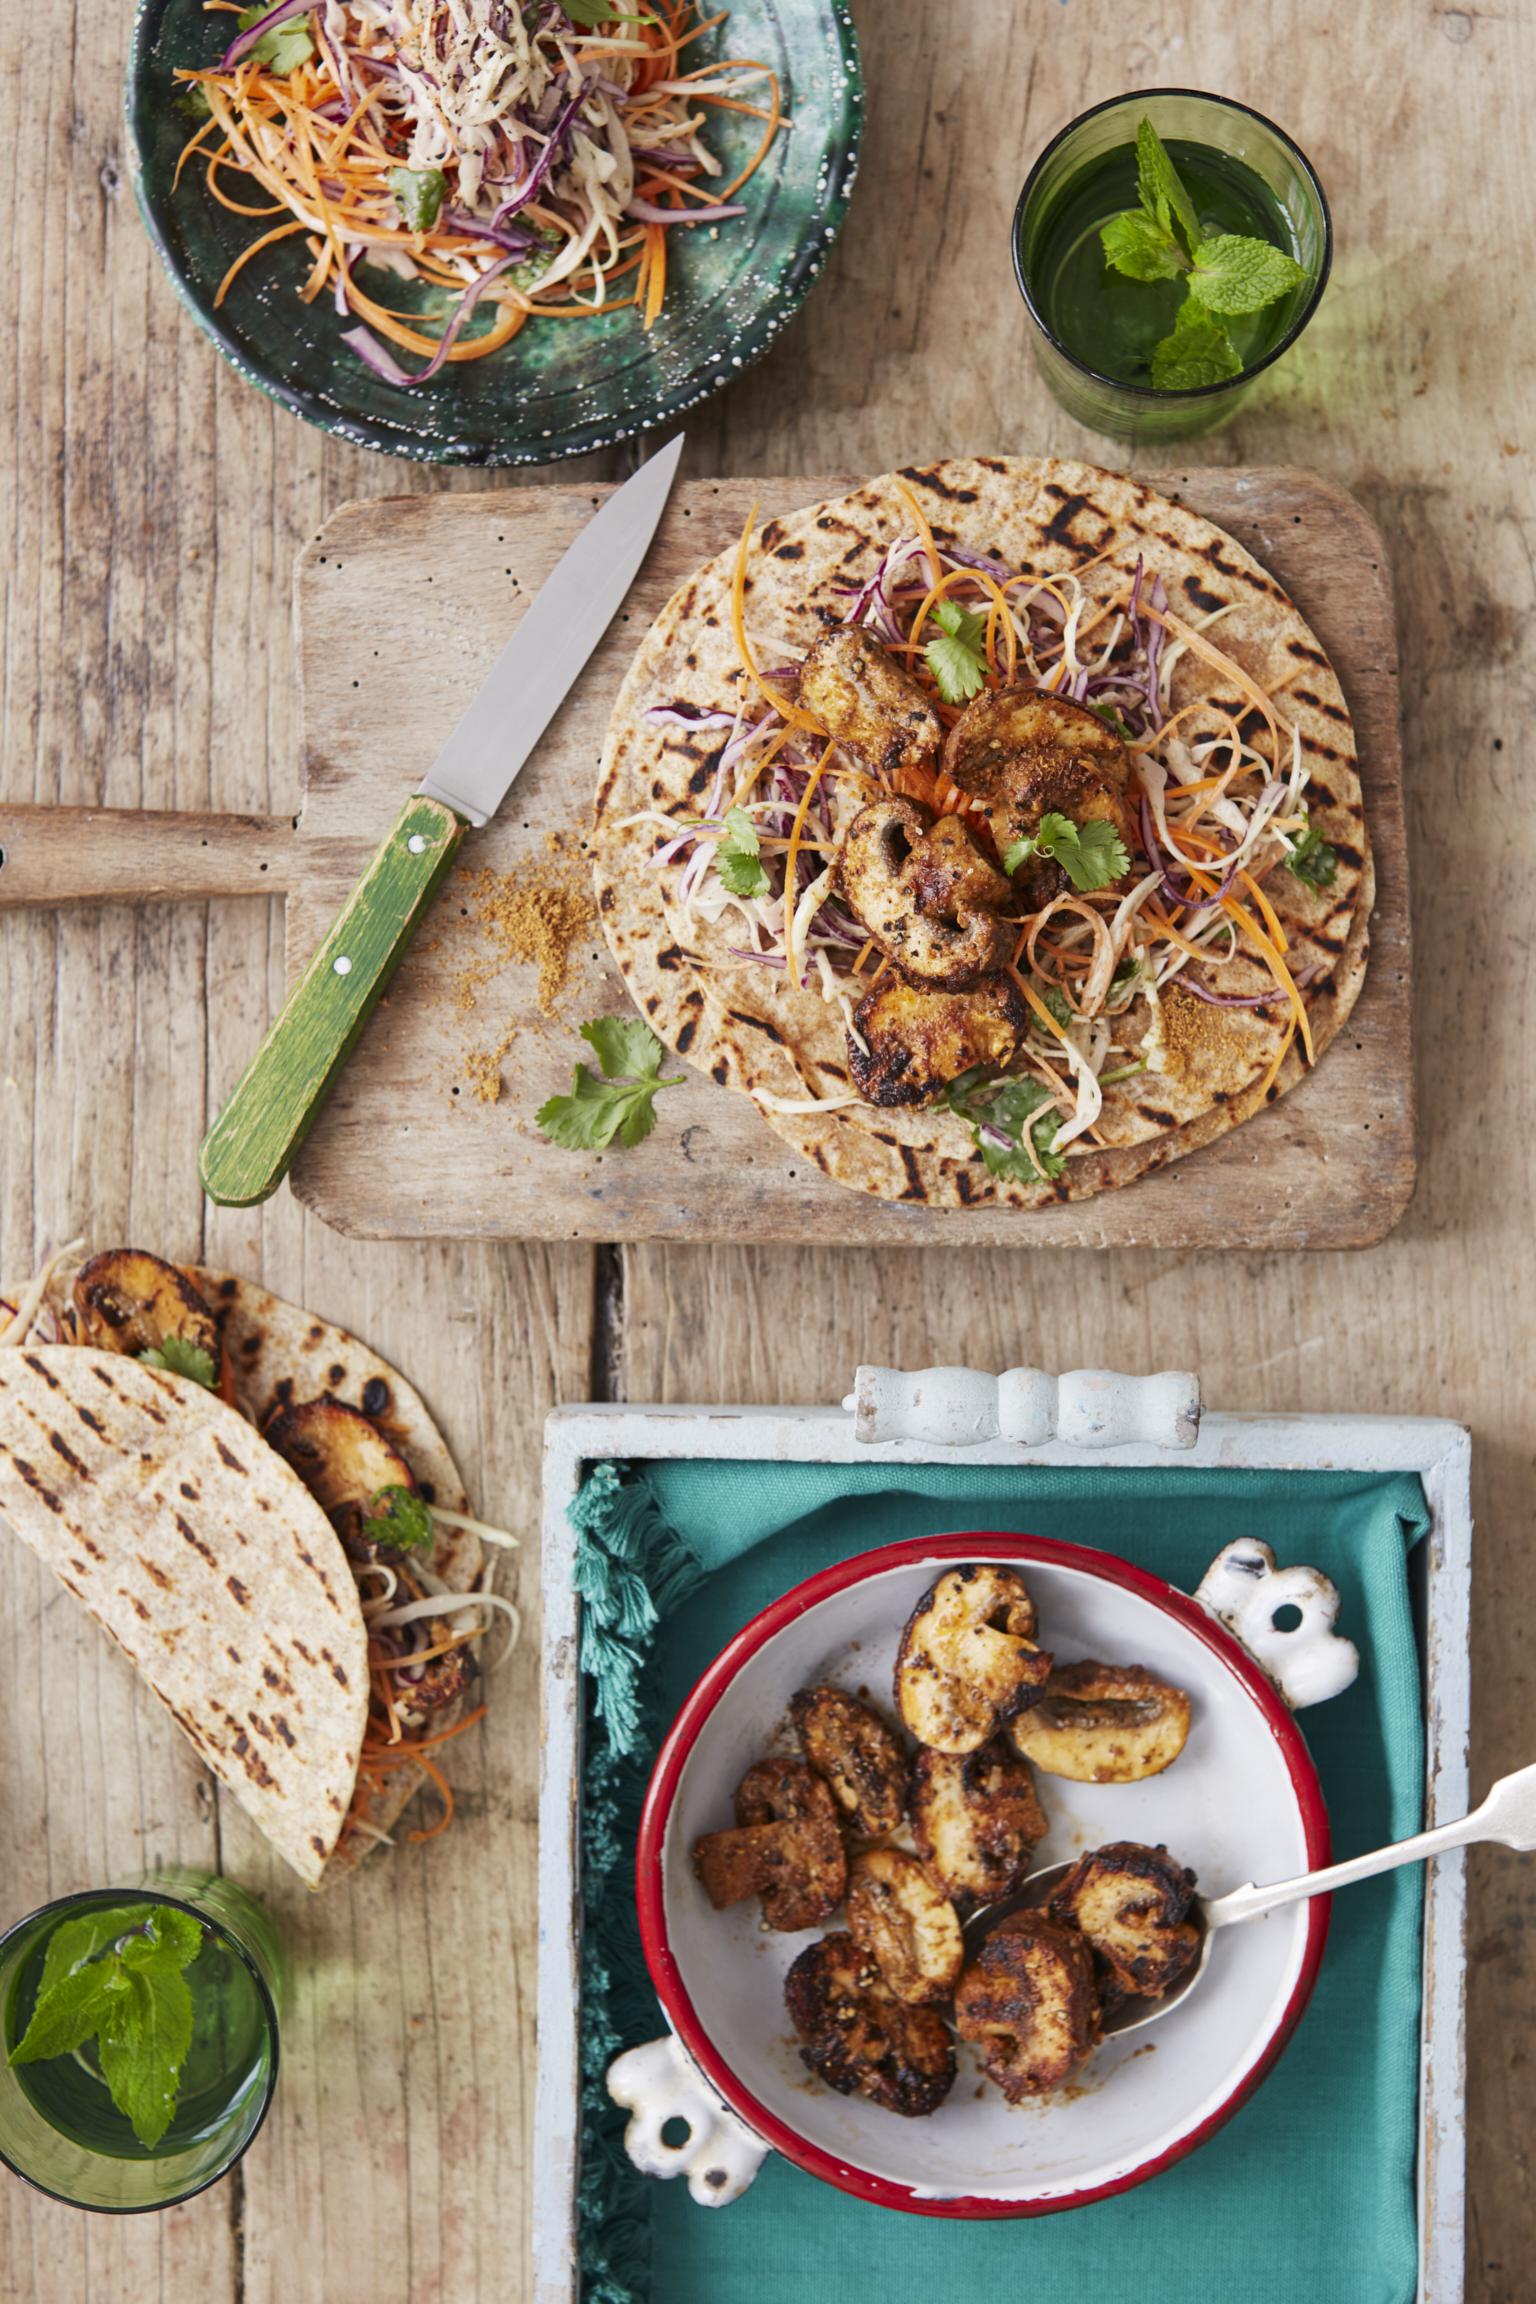 Tandoori Mushroom and Coleslaw Wrap